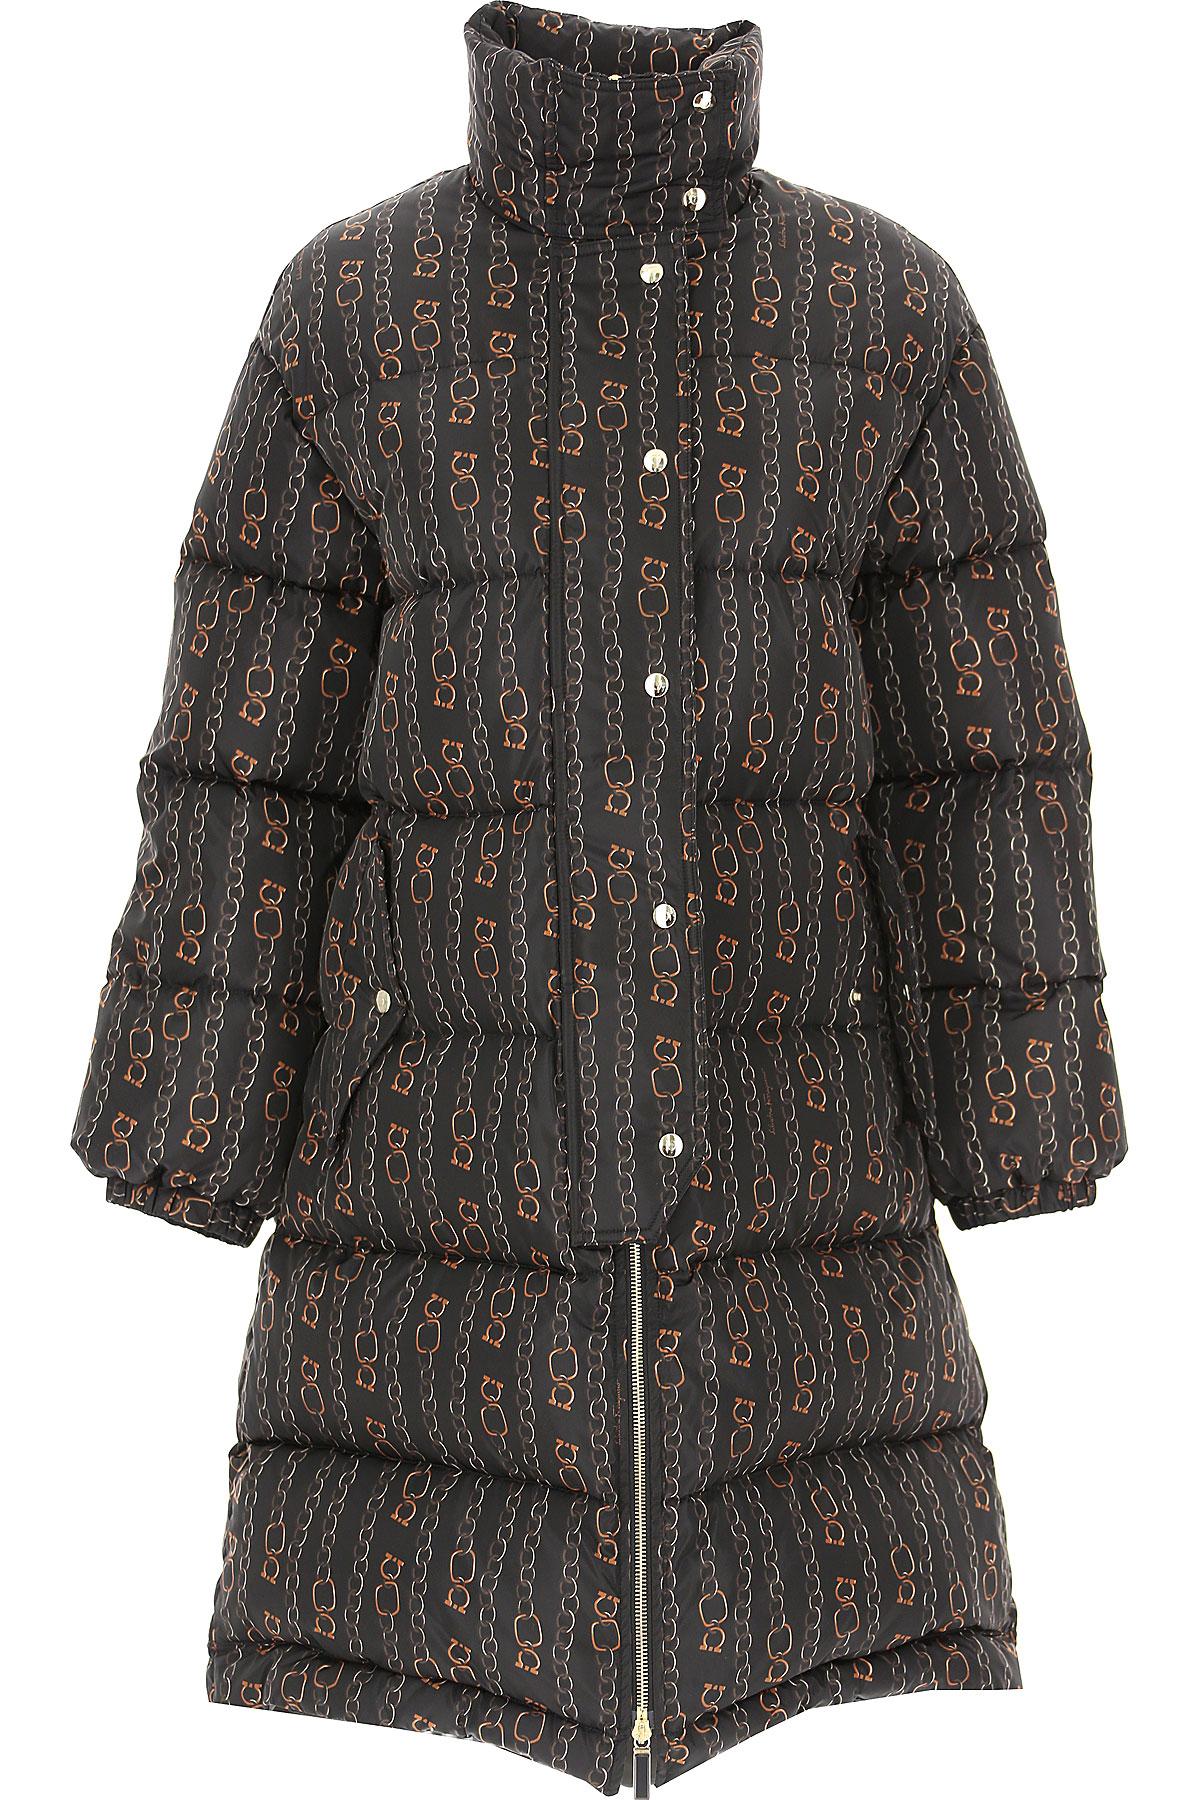 Salvatore Ferragamo Down Jacket for Women, Puffer Ski Jacket On Sale, Black, polyamide, 2019, 10 8